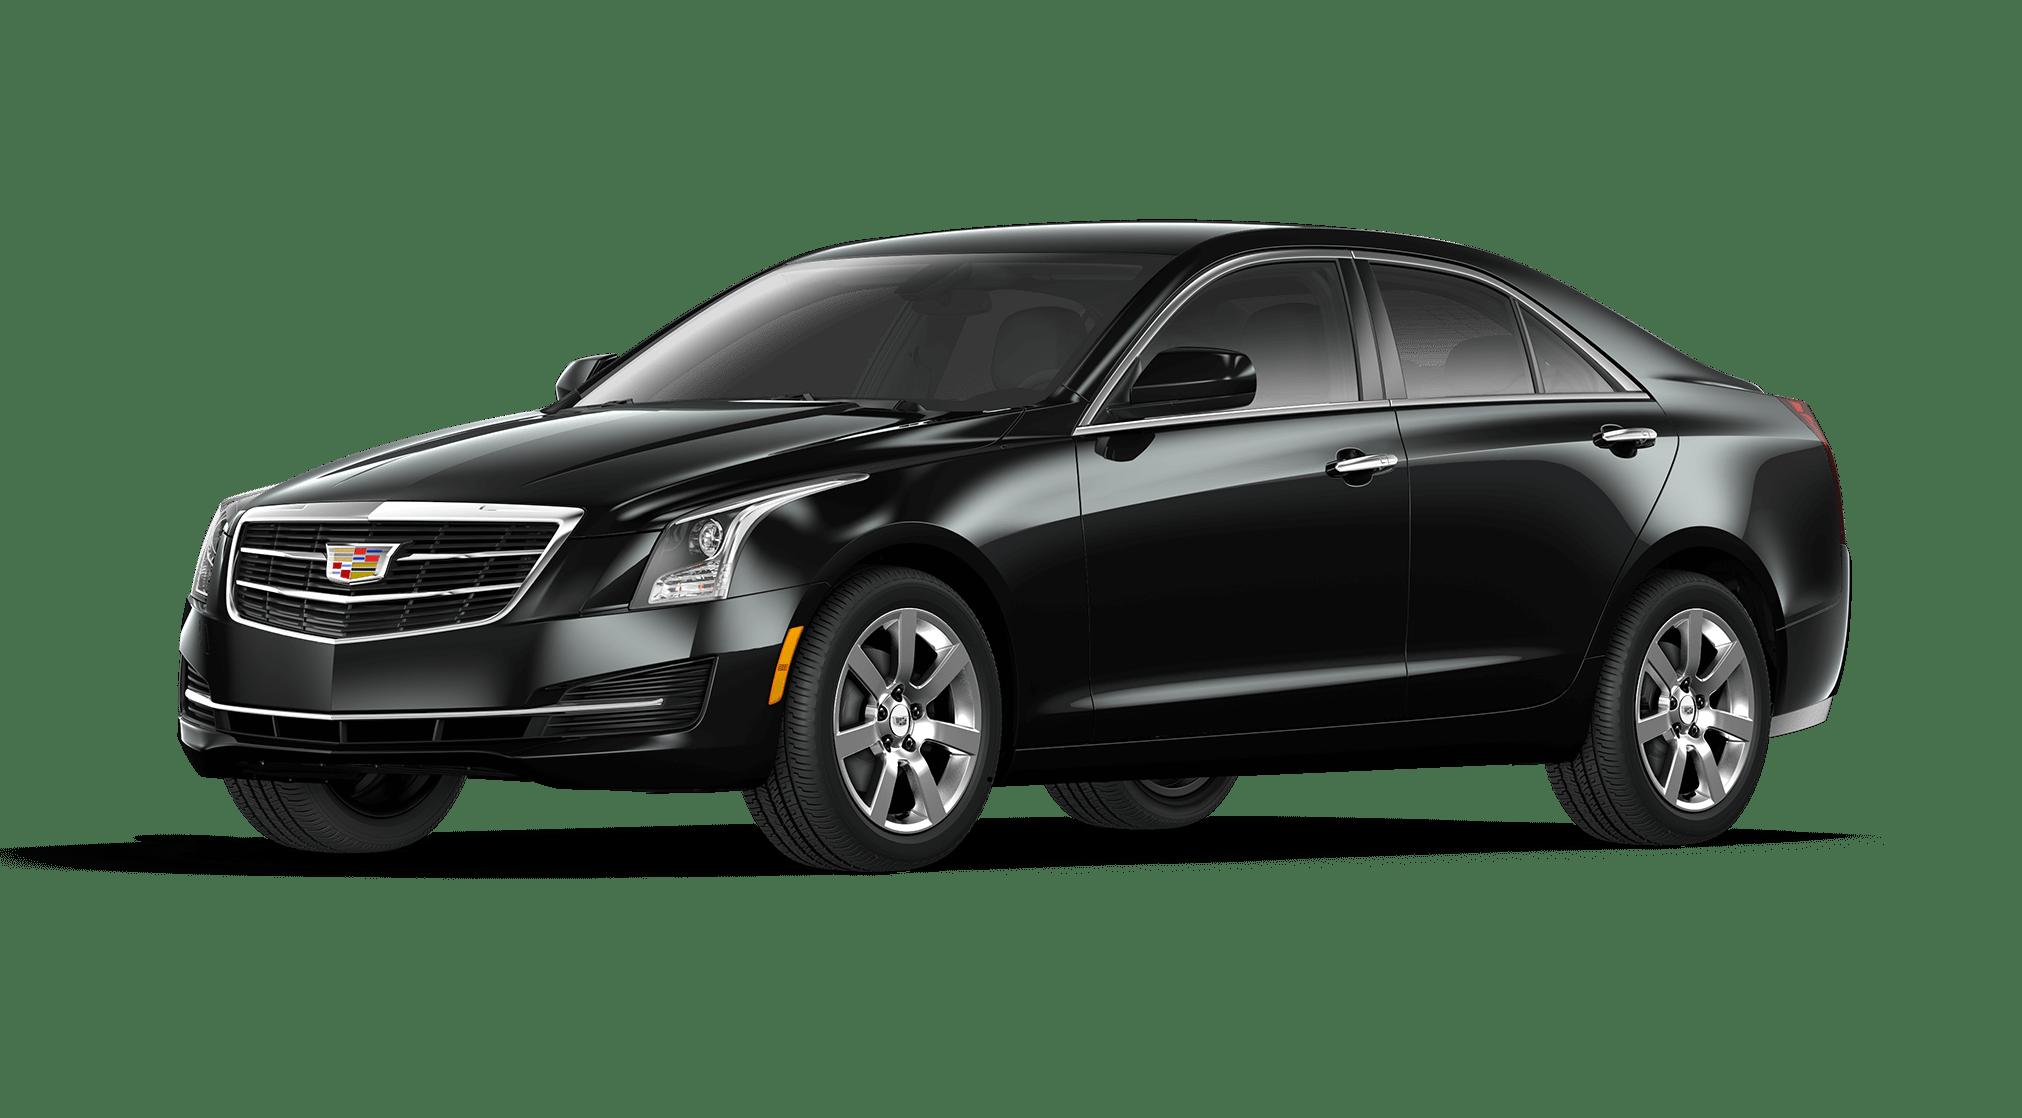 Black Raven Cadillac ATS